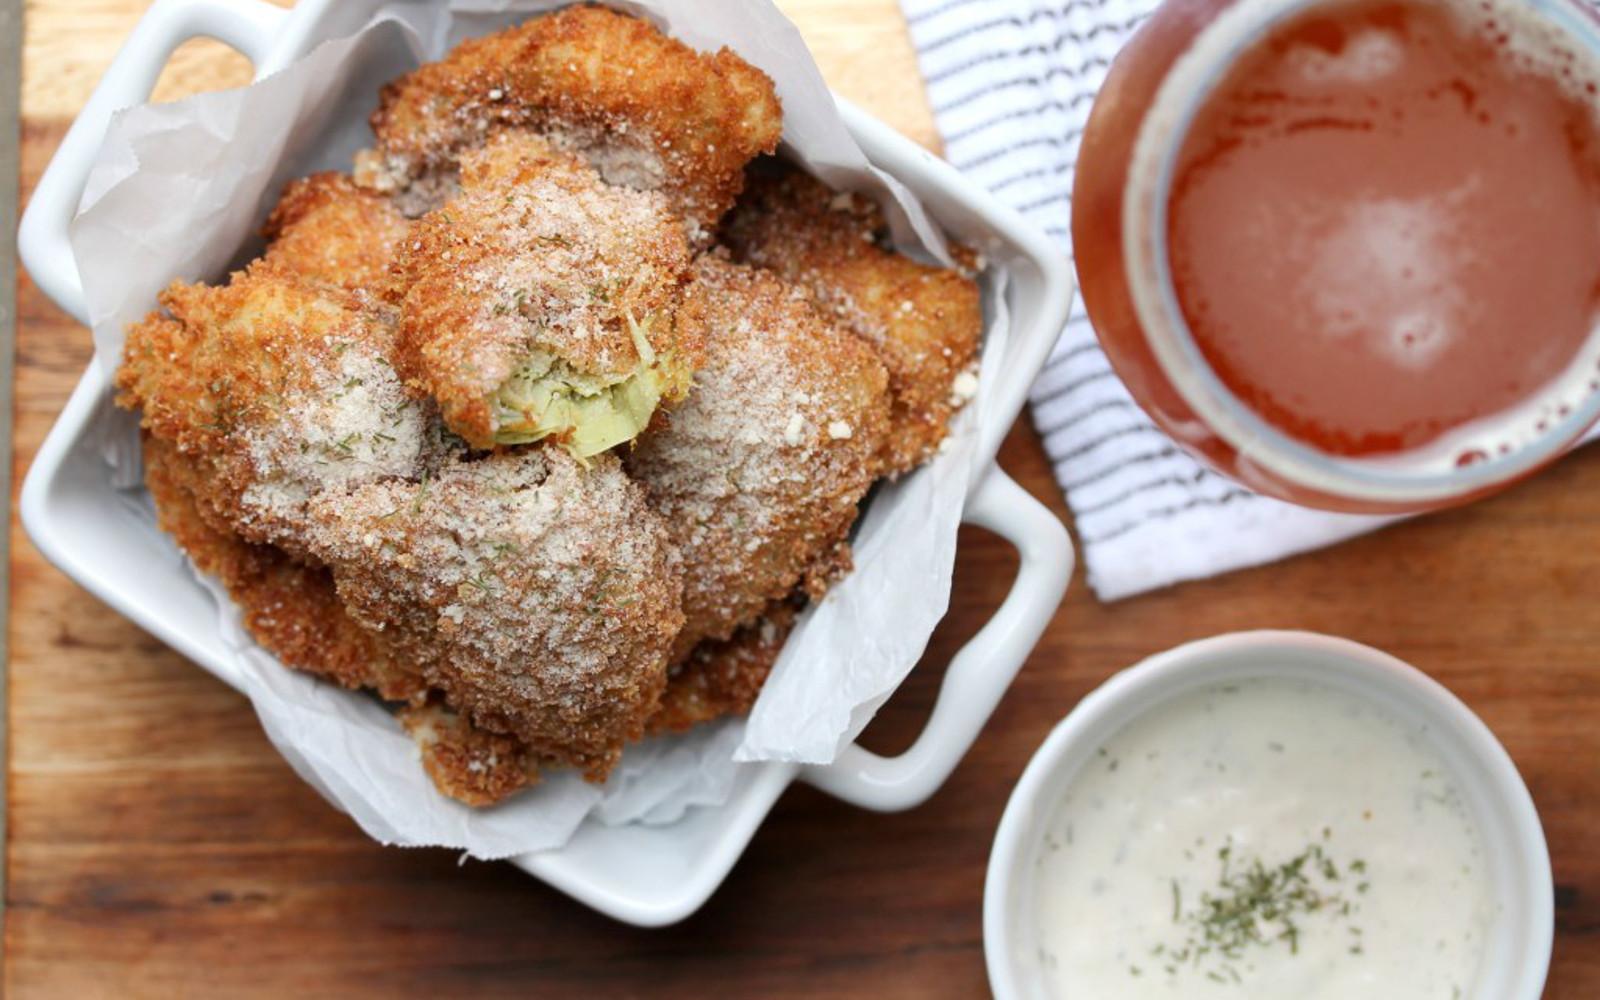 Vegan GLuten-Free Fried Artichoke Hearts With Garlic Dill Aioli and red sauce